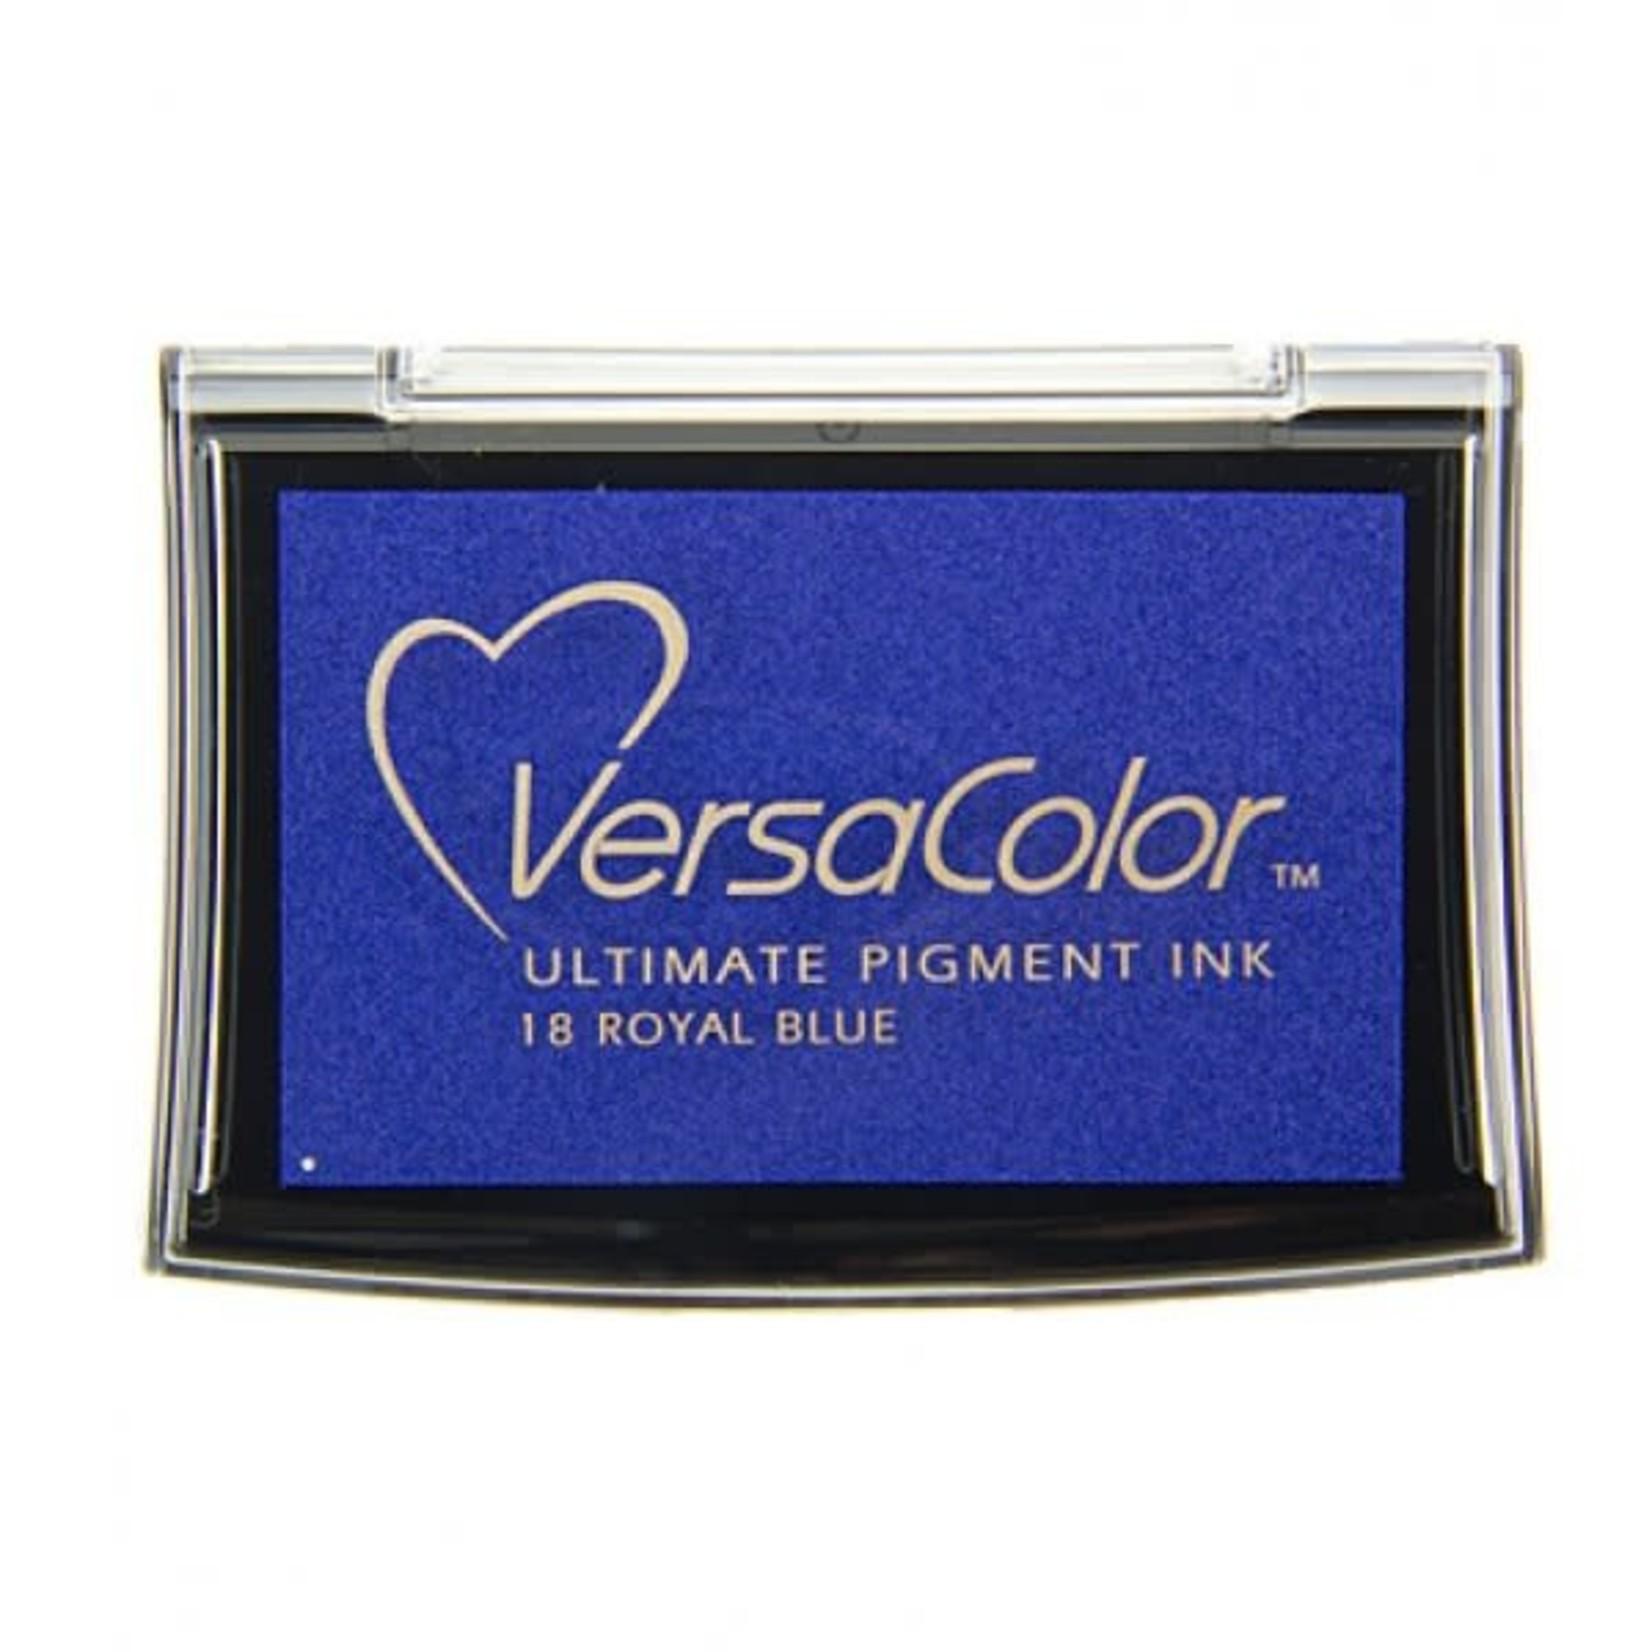 StazOn VersaColor Pigimate Ink Royal Blue